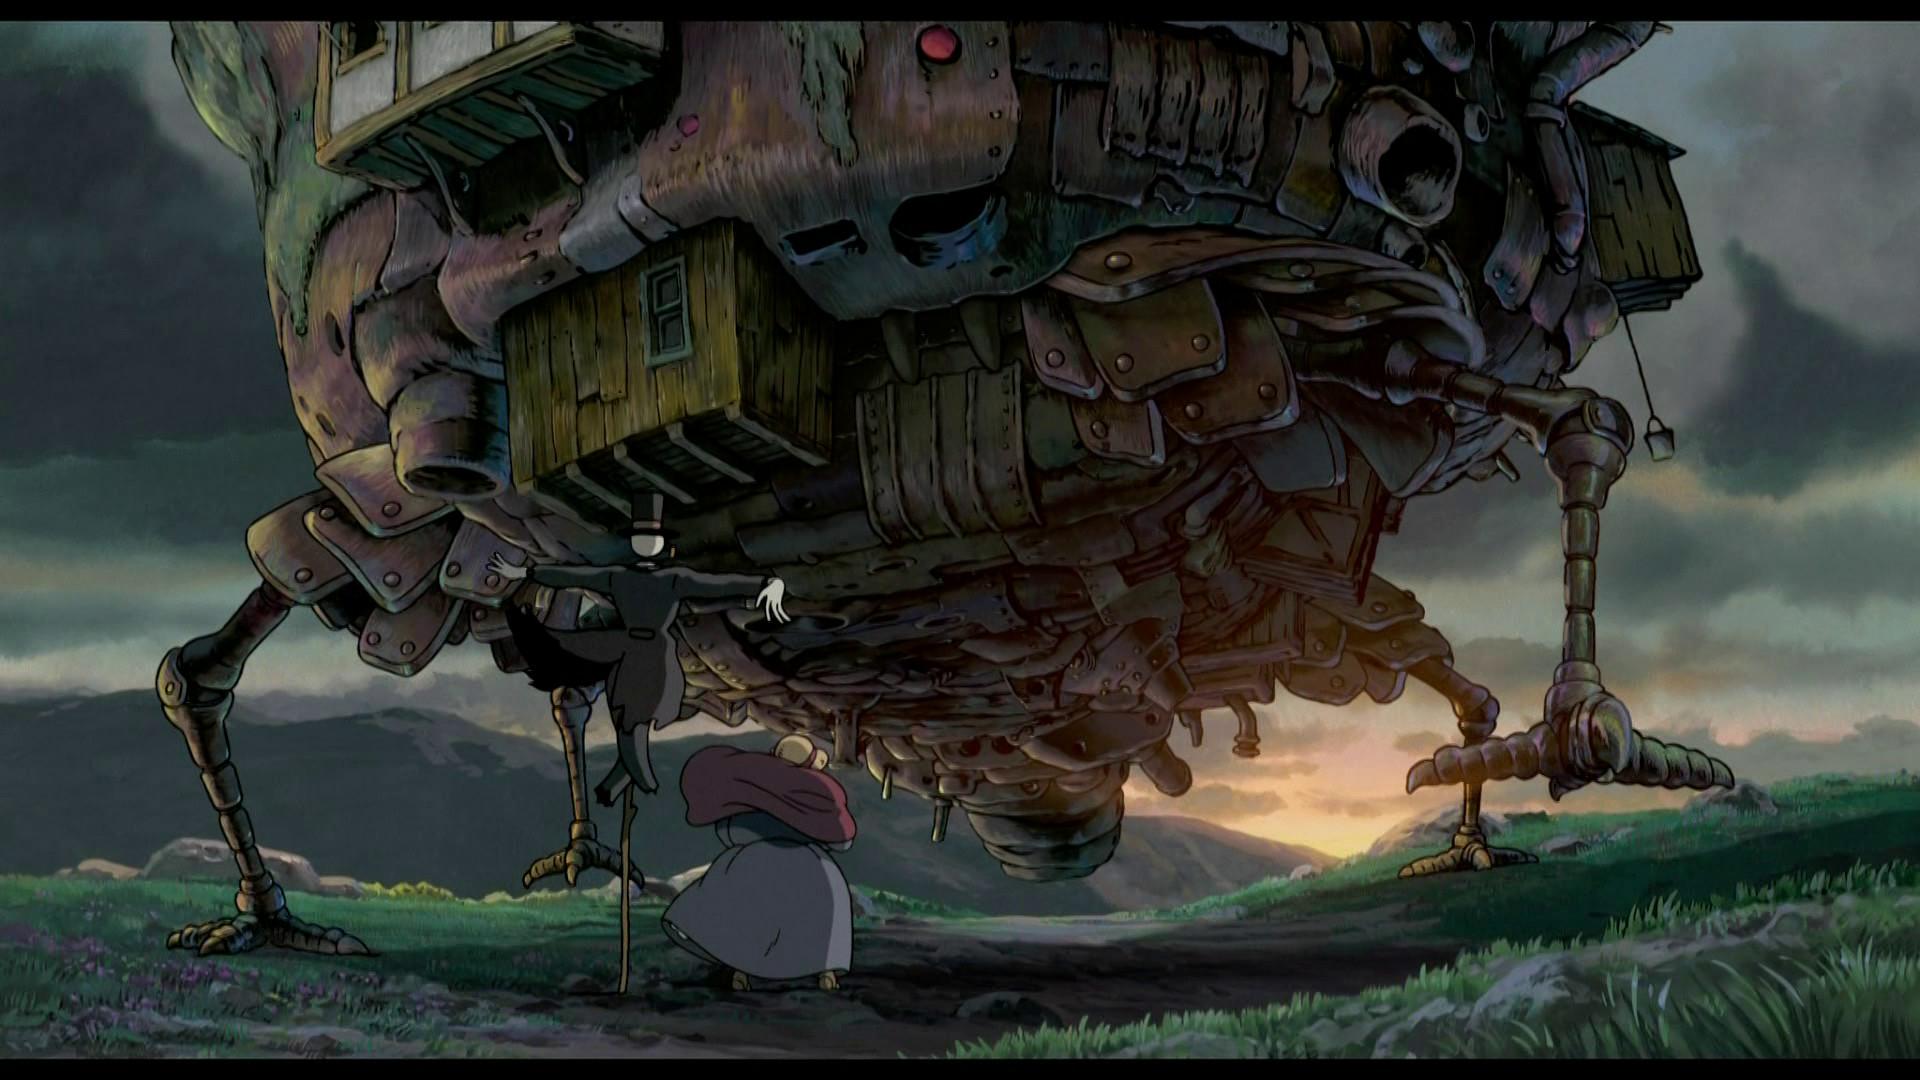 Hayao Miyazaki Howl's Moving Castle wallpaper – 896140